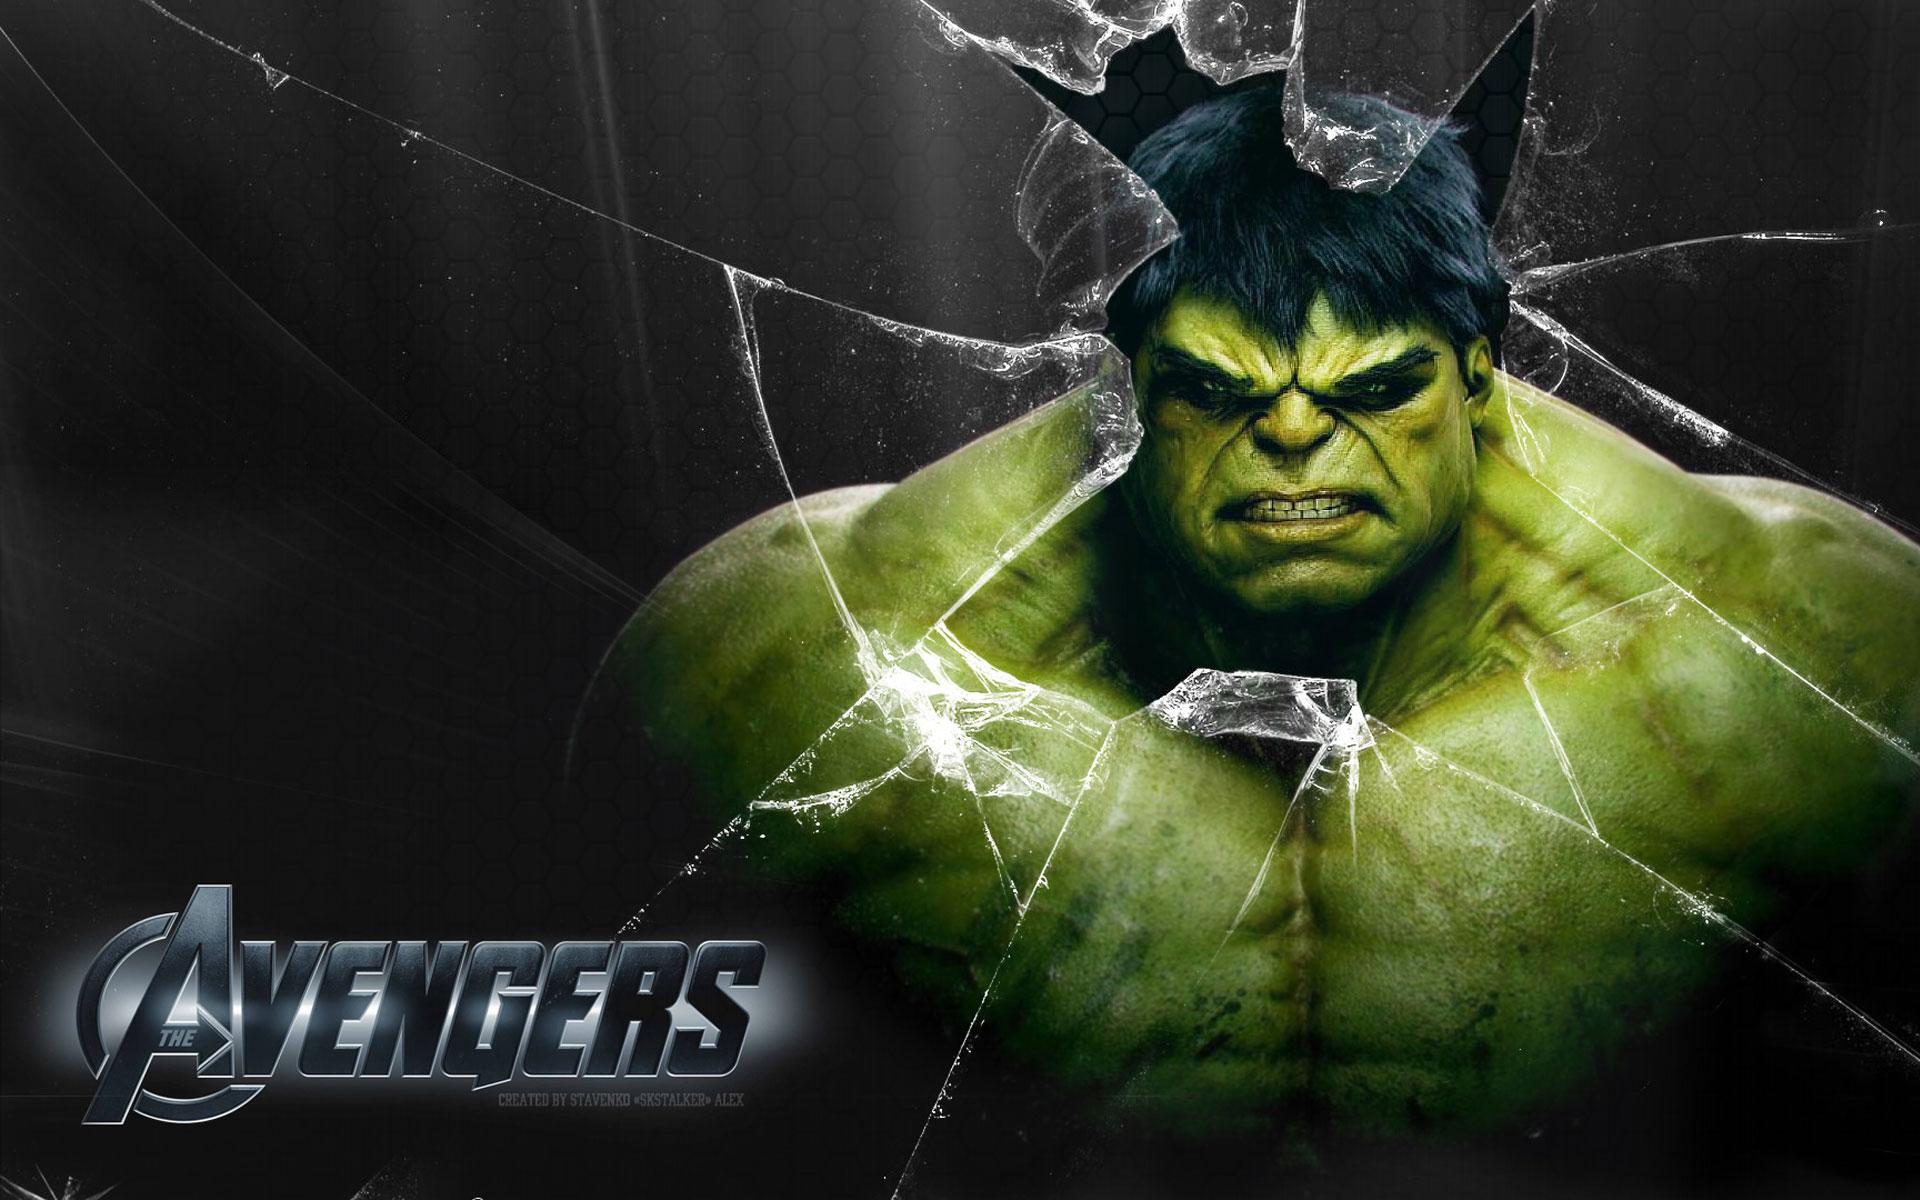 Hulk Avengers Smi HD Wallpaper Background Images 1920x1200